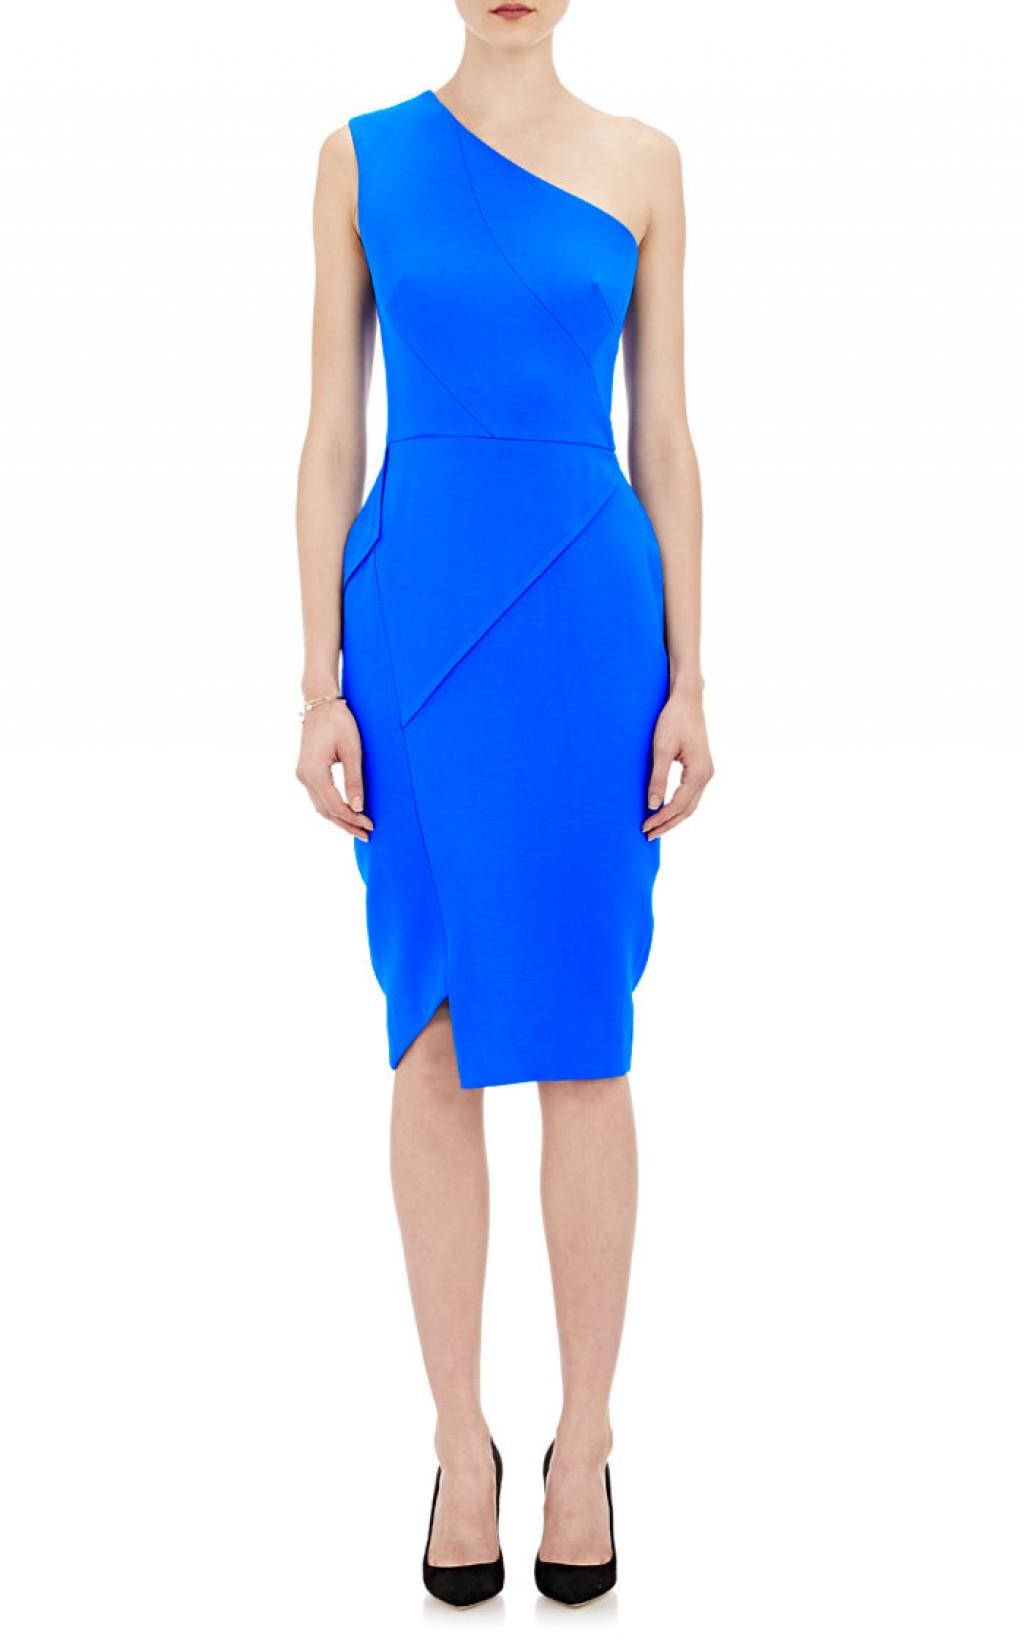 victoria-beckham-blue-dress-jennifer-lopez-1024x1641